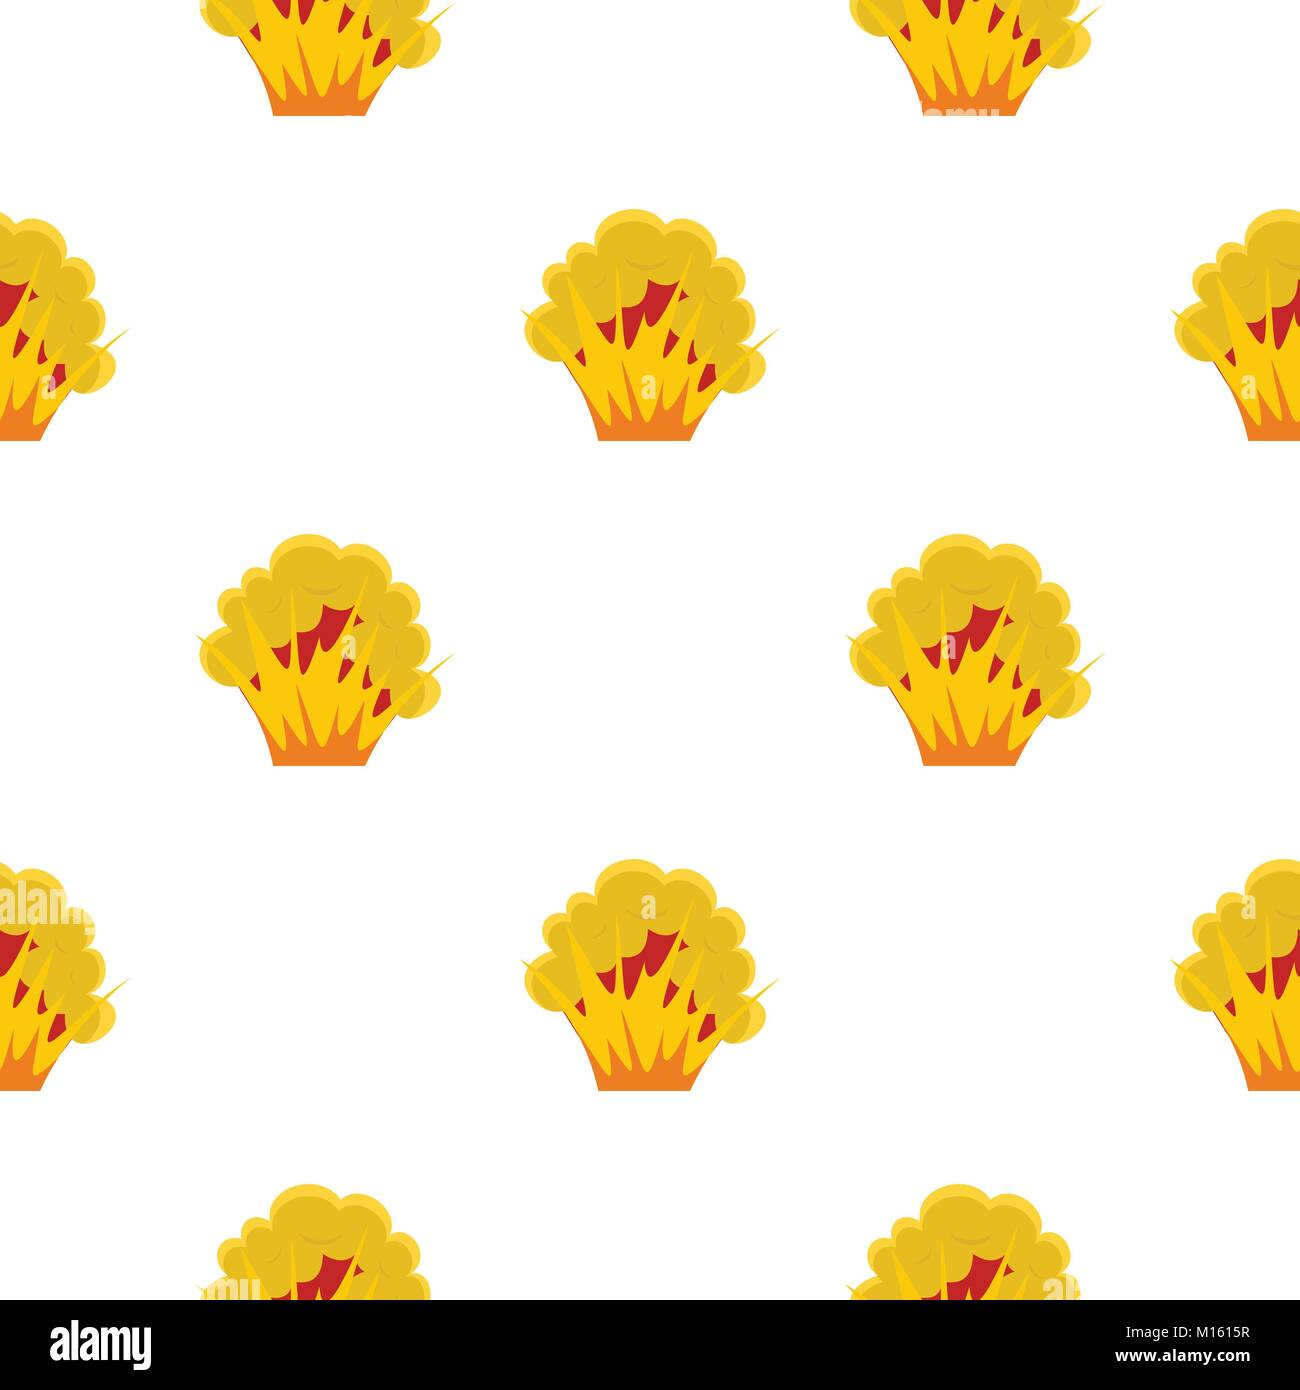 Flame and smoke pattern seamless - Stock Image